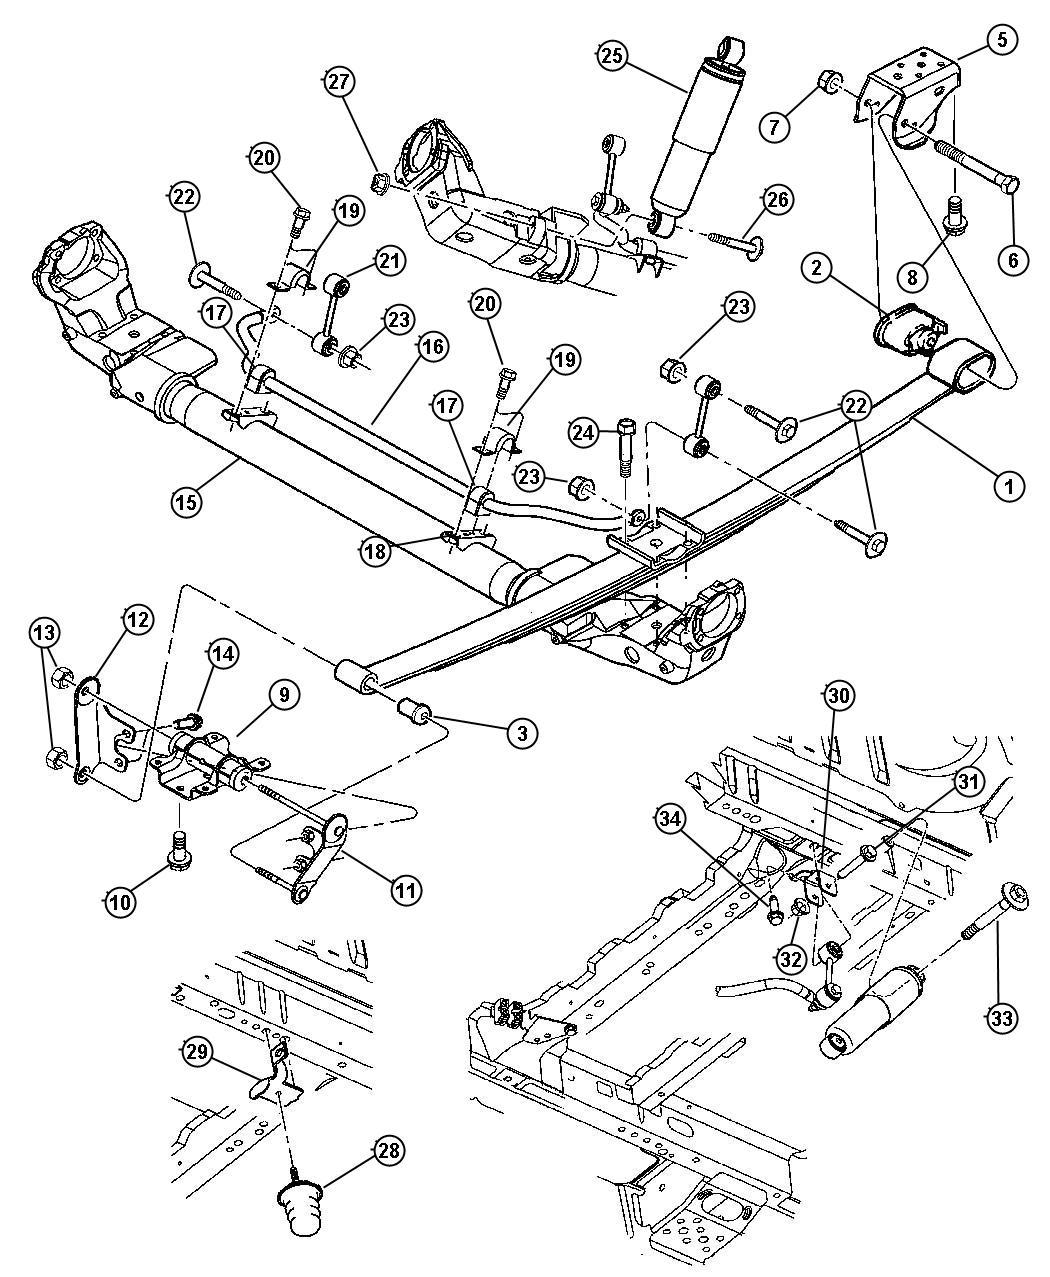 Dodge Ram Coil Spring Rear Suspension Diagram